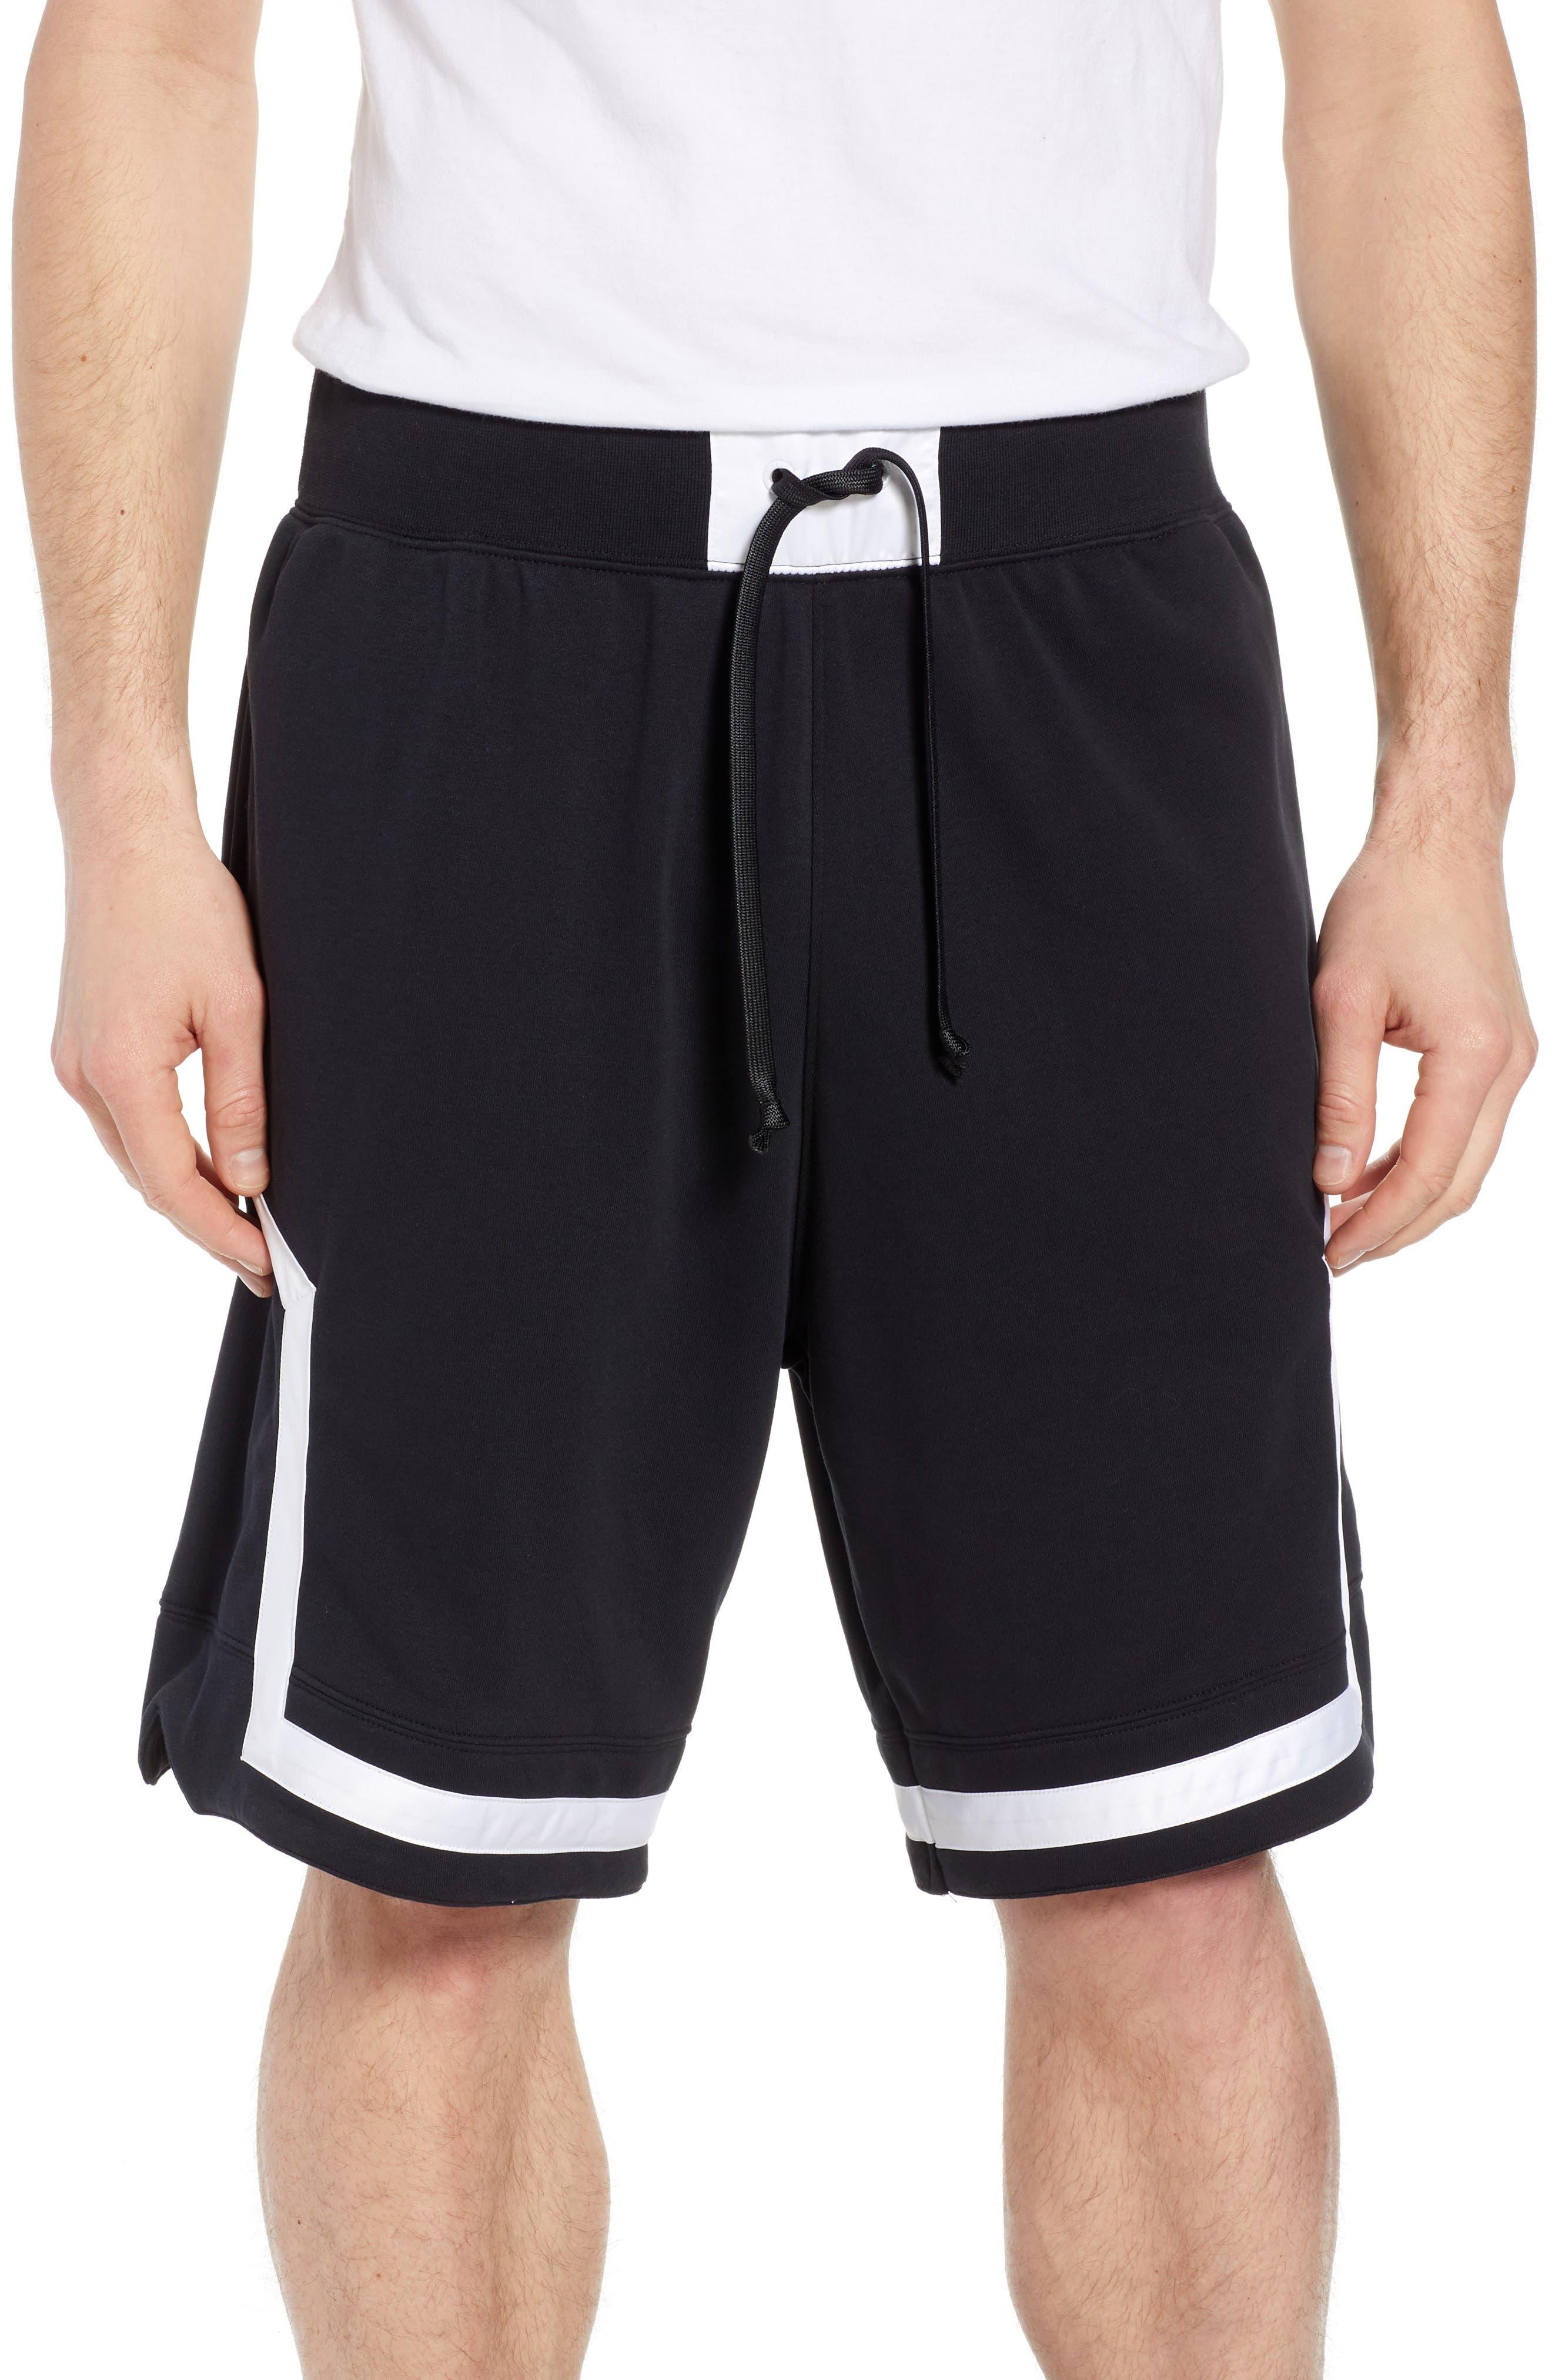 Nike Air Force One Shorts, Black